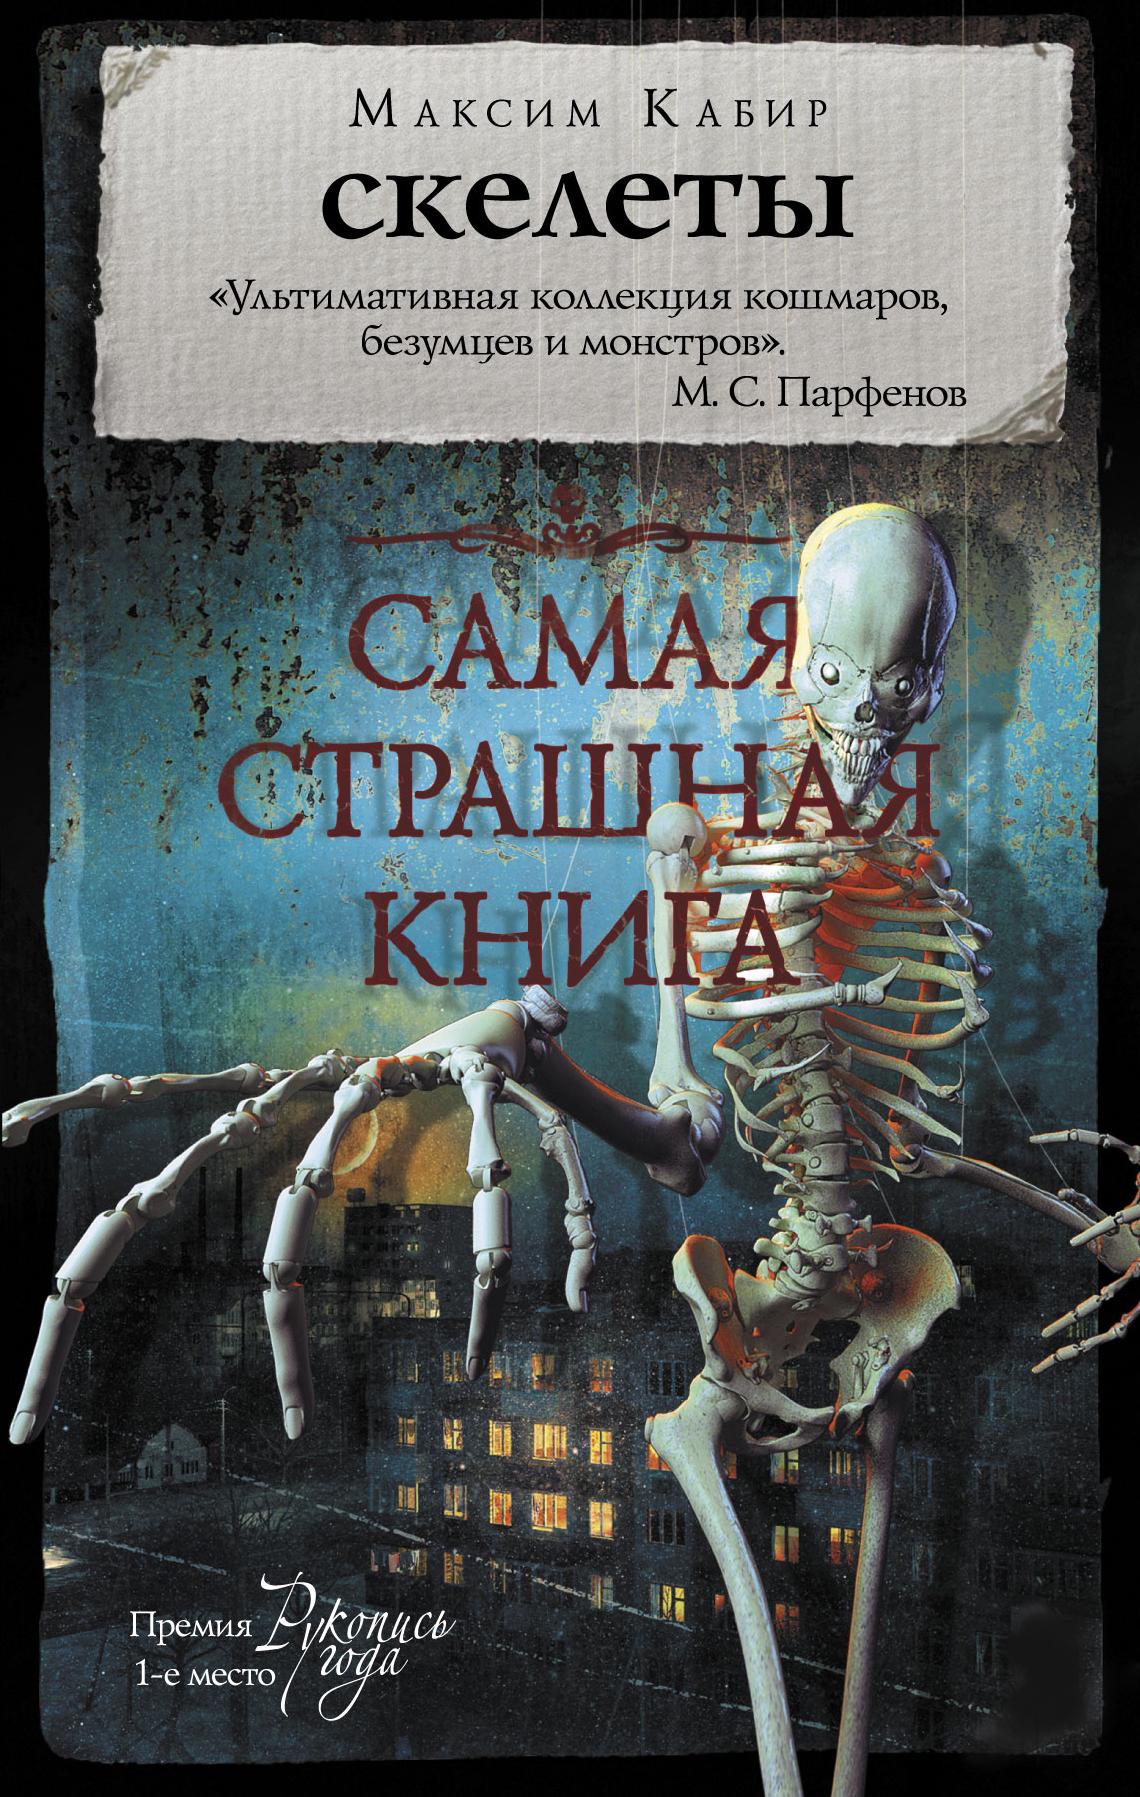 Кабир М.А. Самая страшная книга. Скелеты ISBN: 978-5-17-109999-2